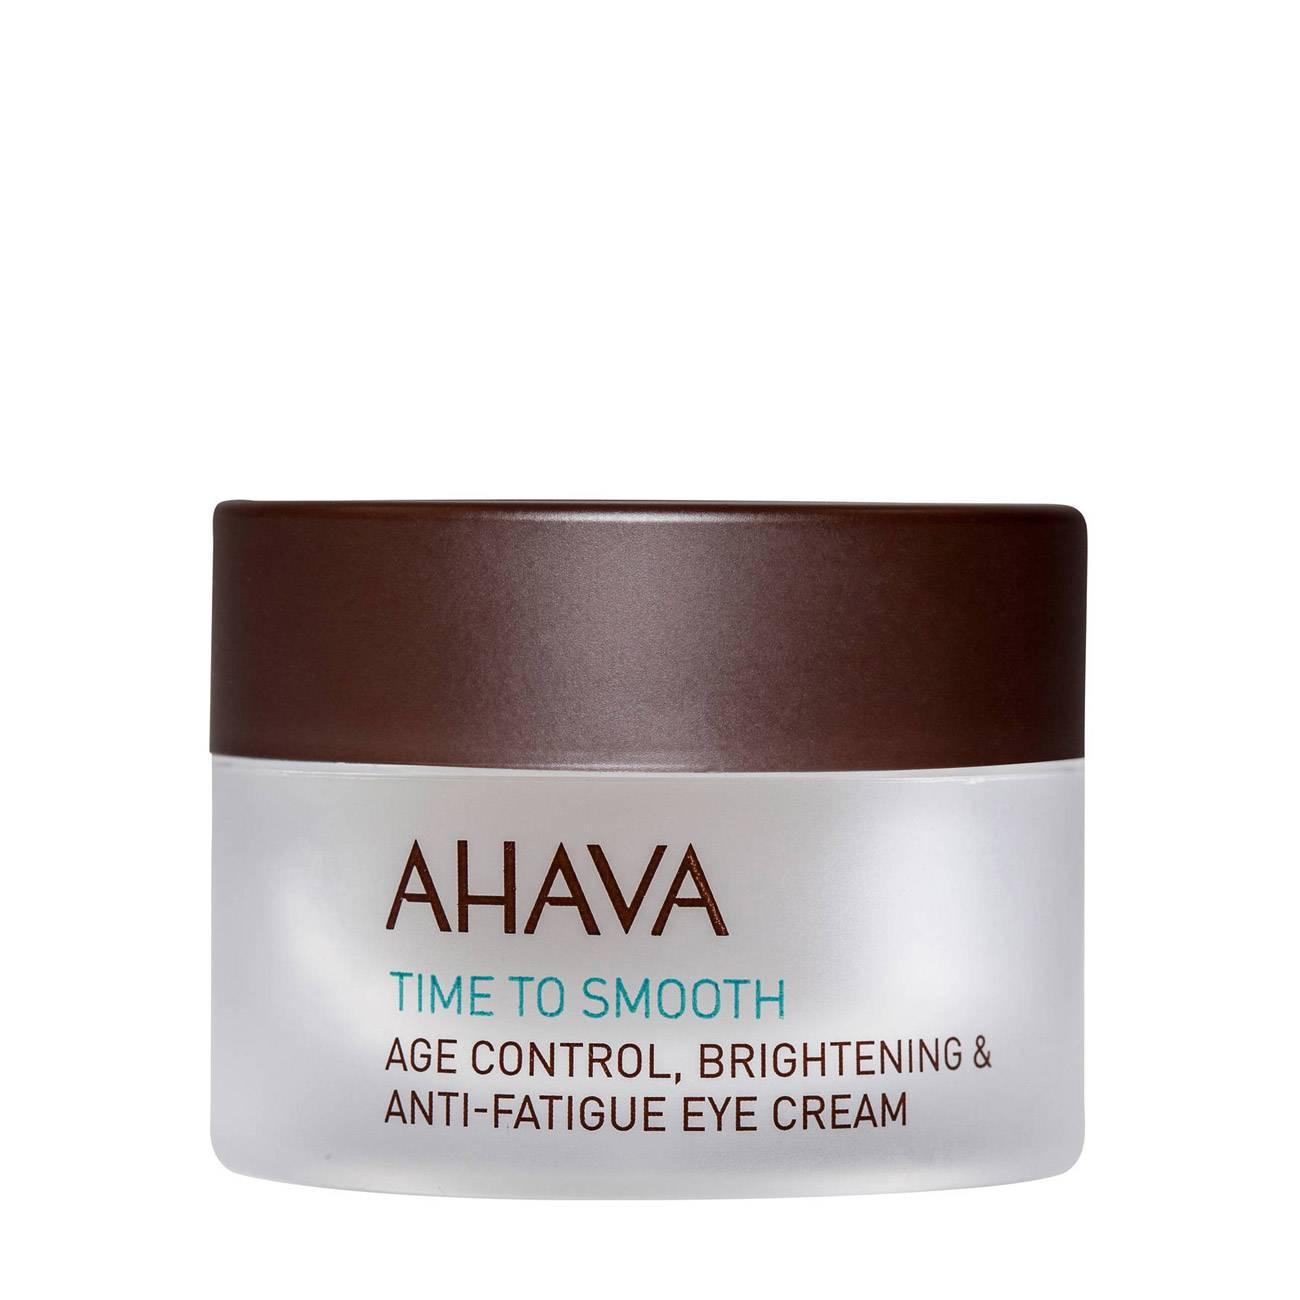 Time To Smooth Age Control Brightening Eye Cream 15ml Ahava imagine 2021 bestvalue.eu